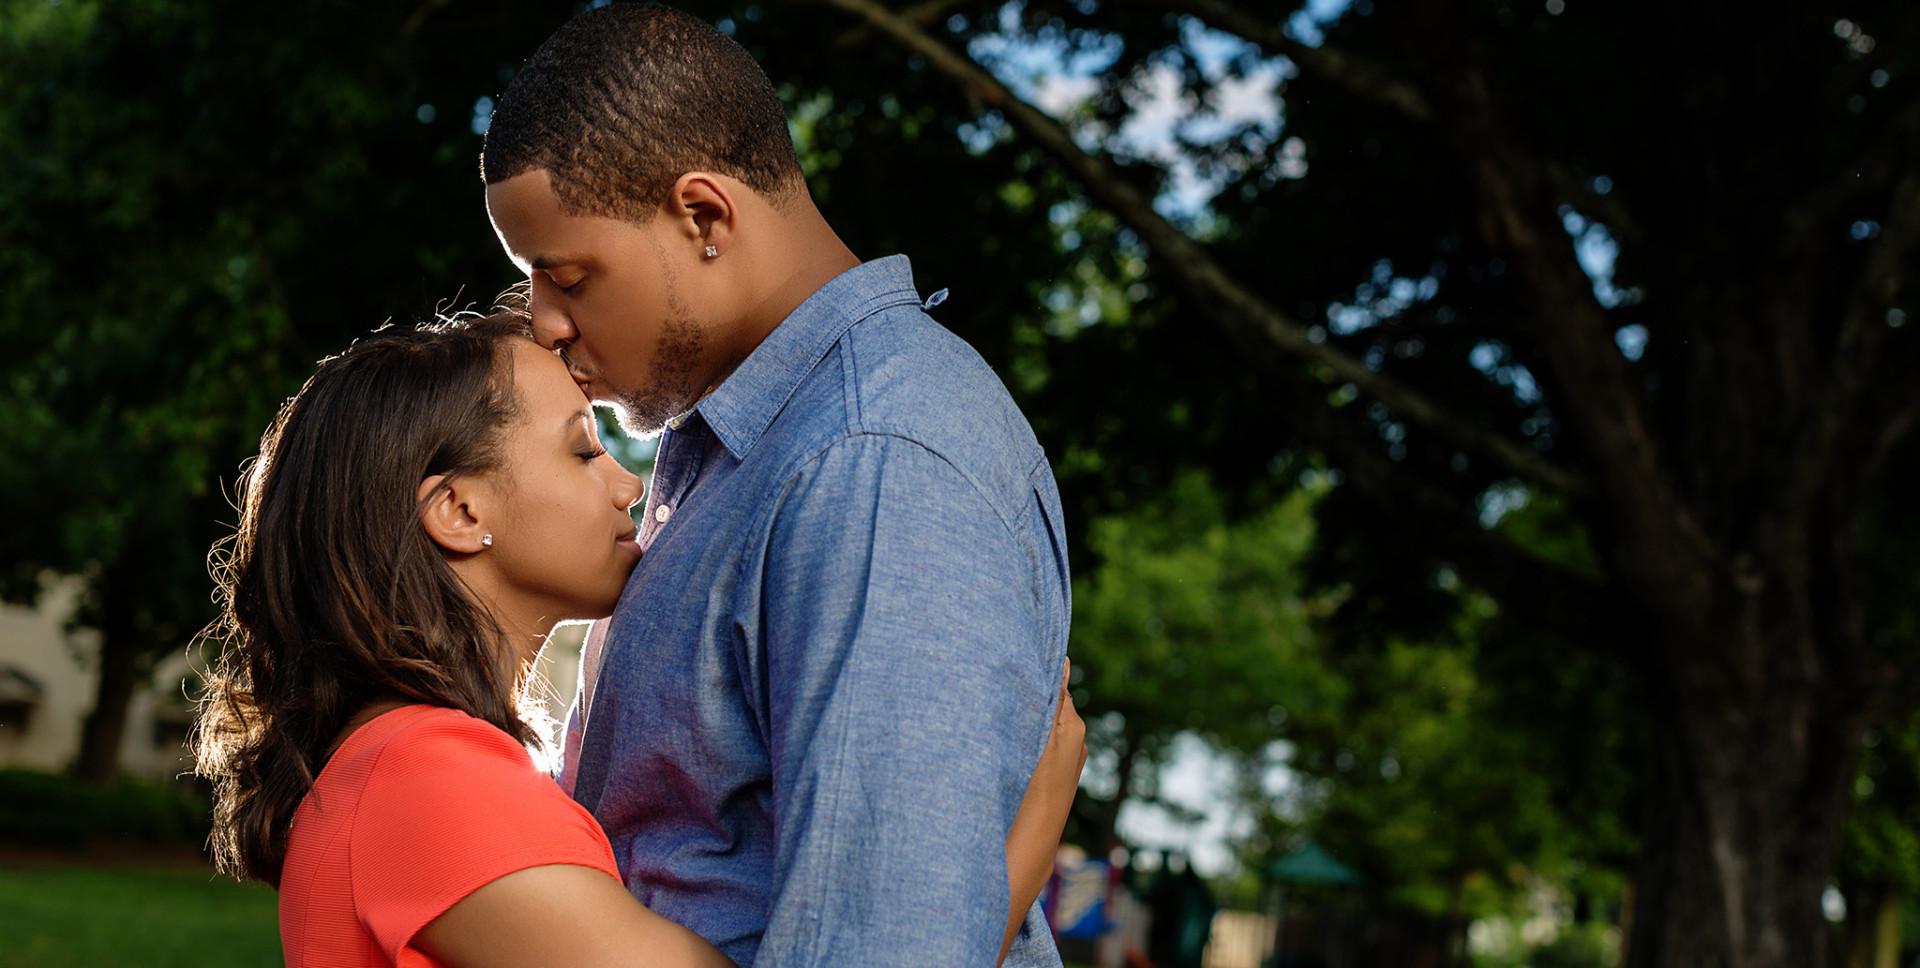 Matchcom - Find Singles with Matchcom's Online Dating